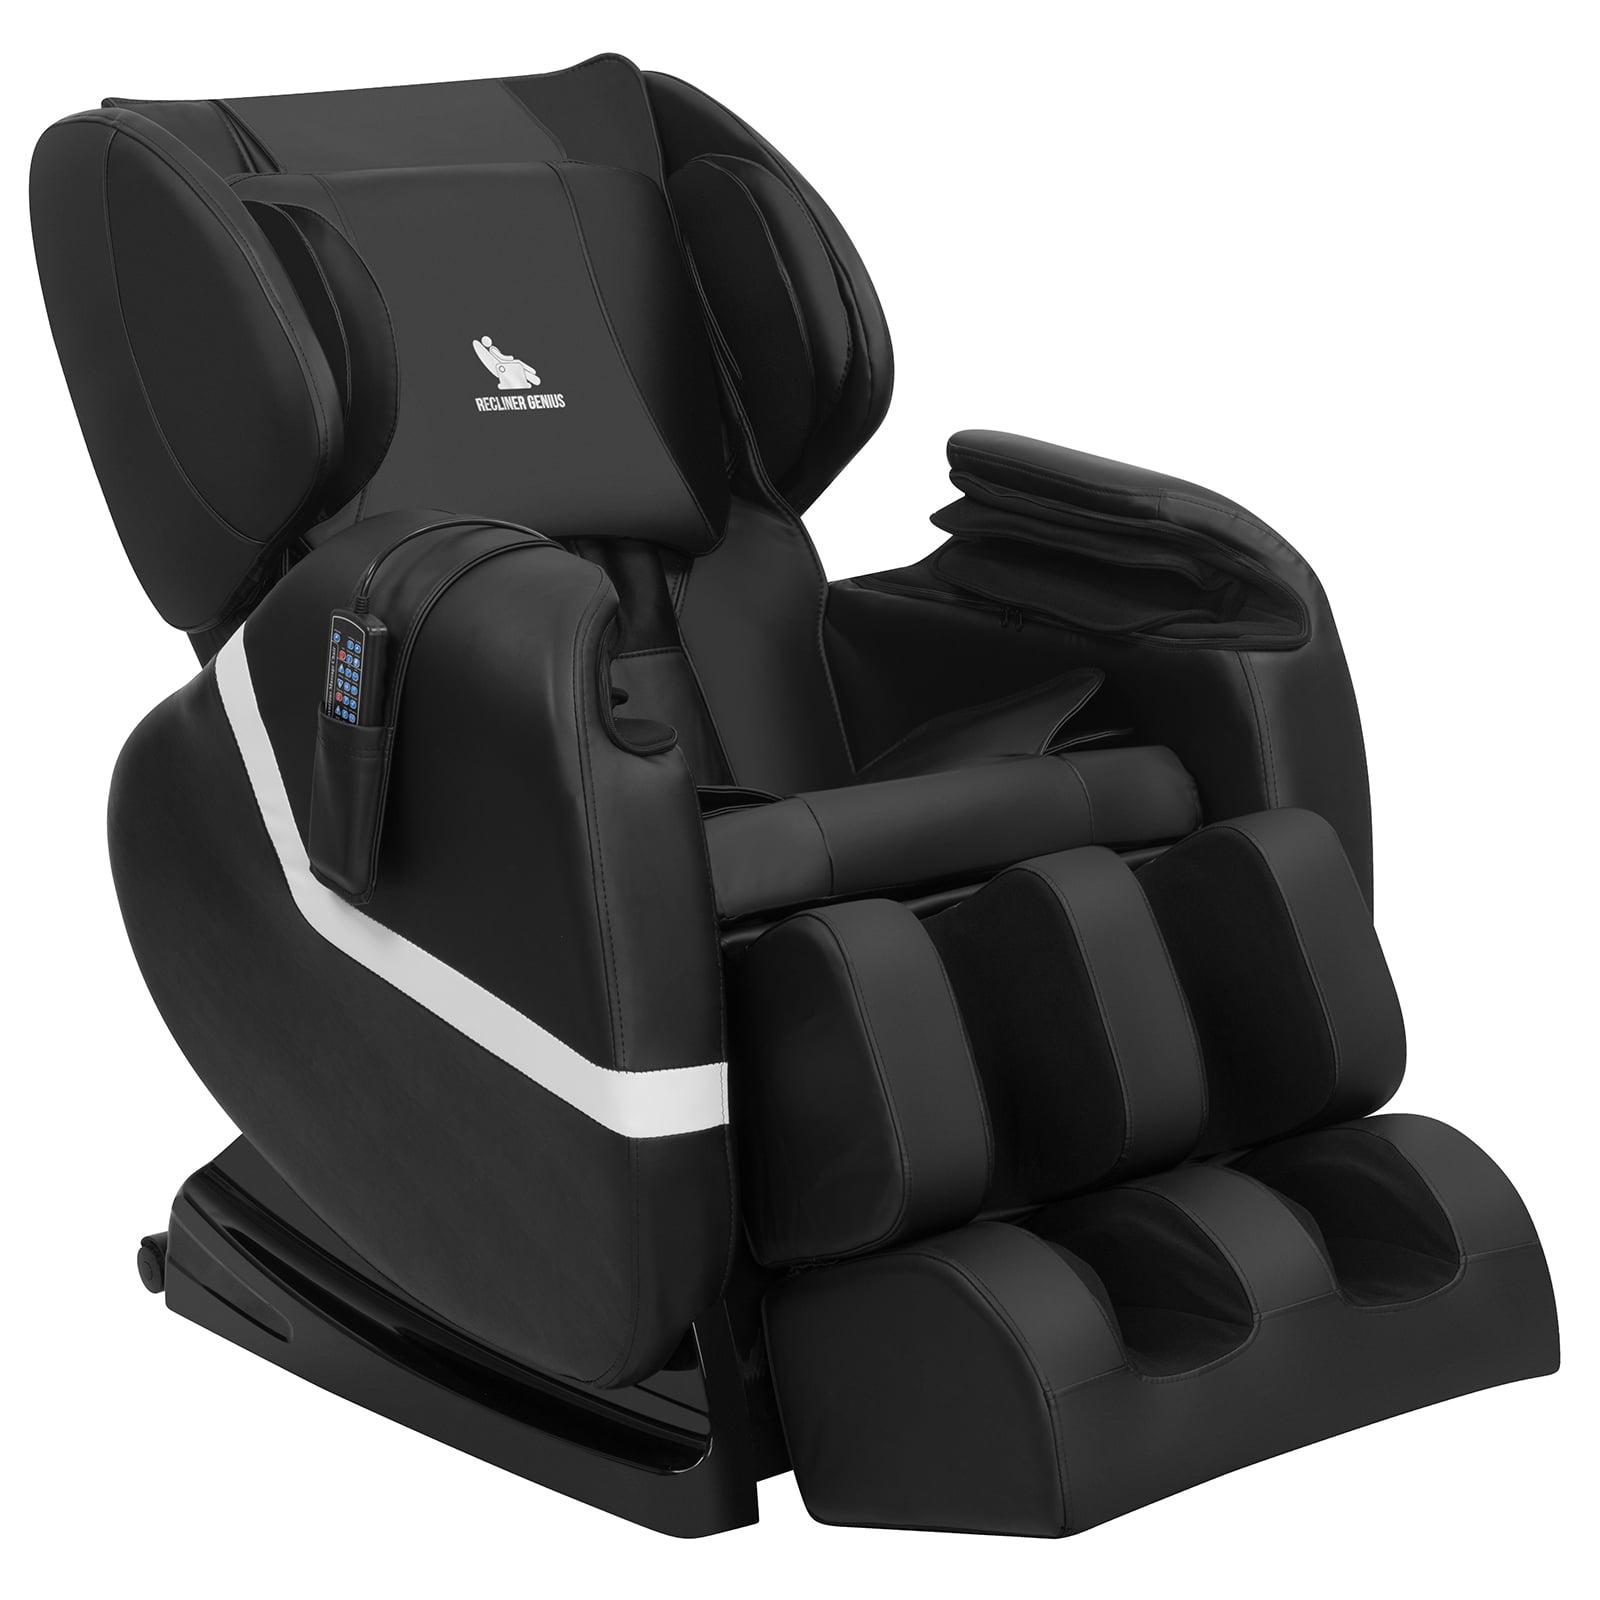 Uenjoy Full Body Zero Gravity Massage Chair Shiatsu Recliner